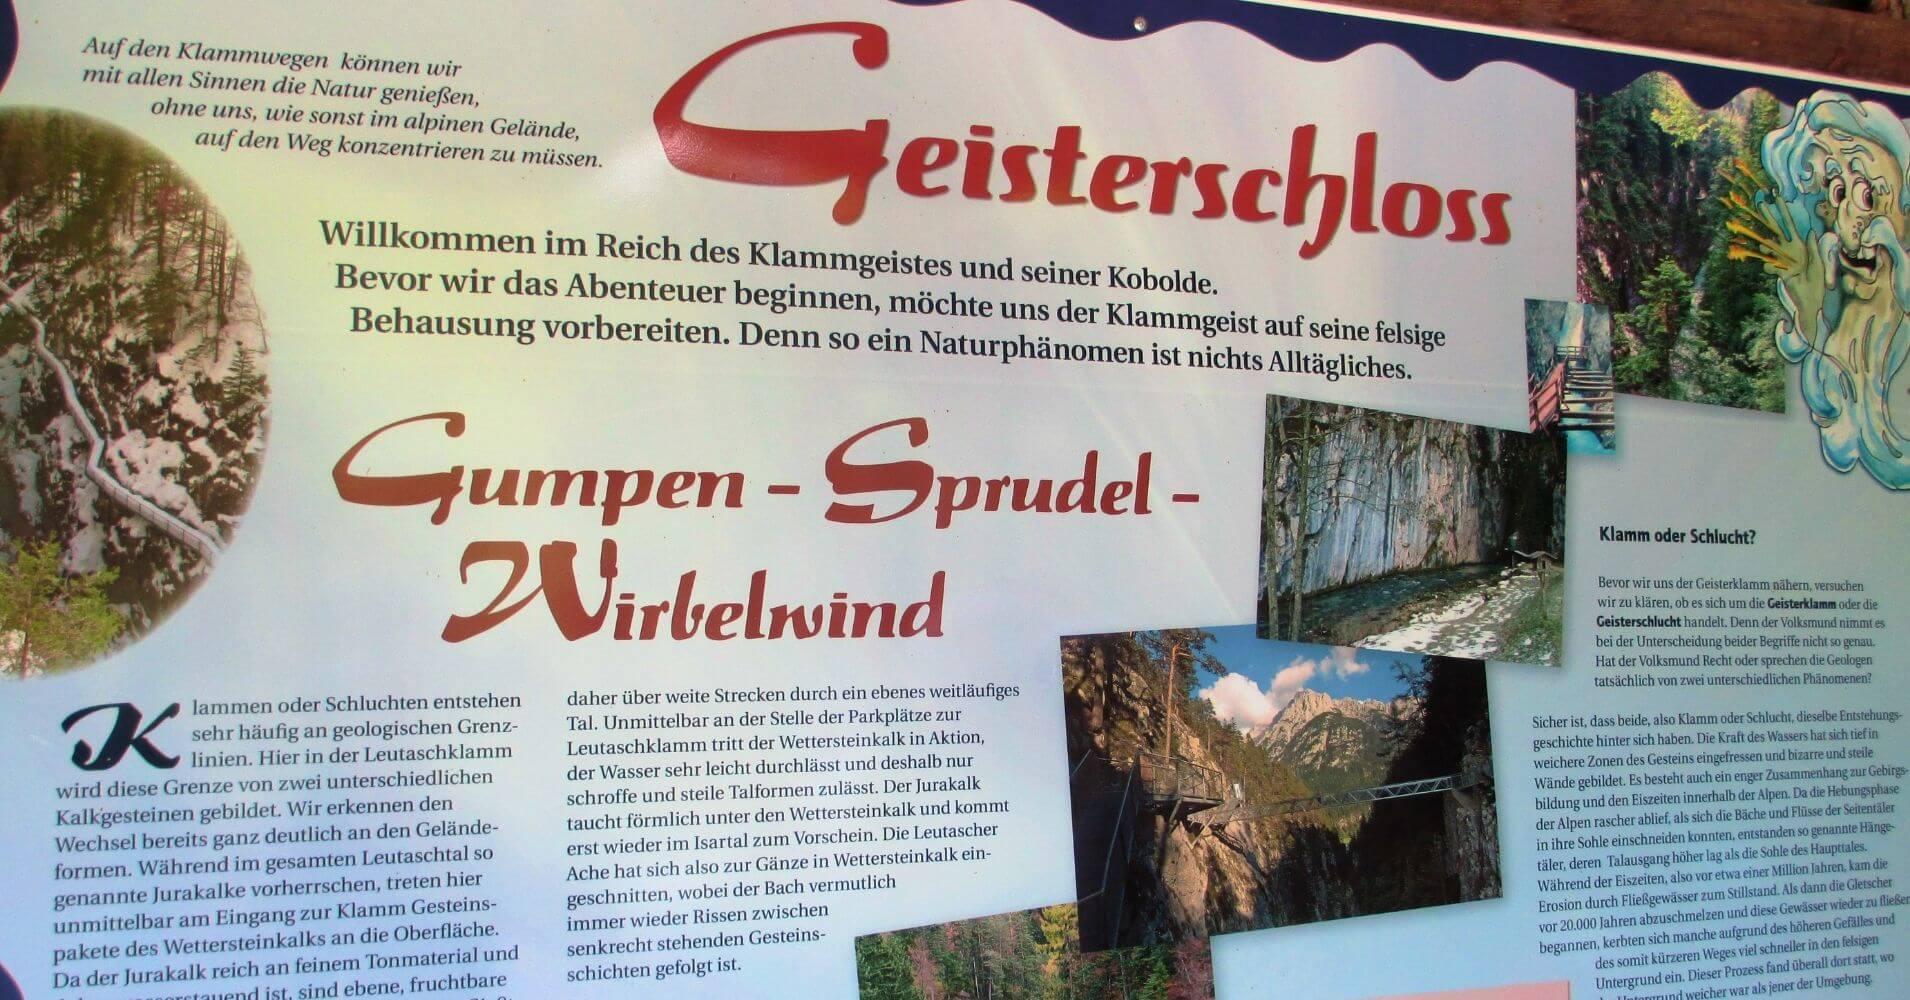 Cartel de Información. Garganta Leutaschklamm. Schanz, Leutasch. Región del Tirol. Austria.